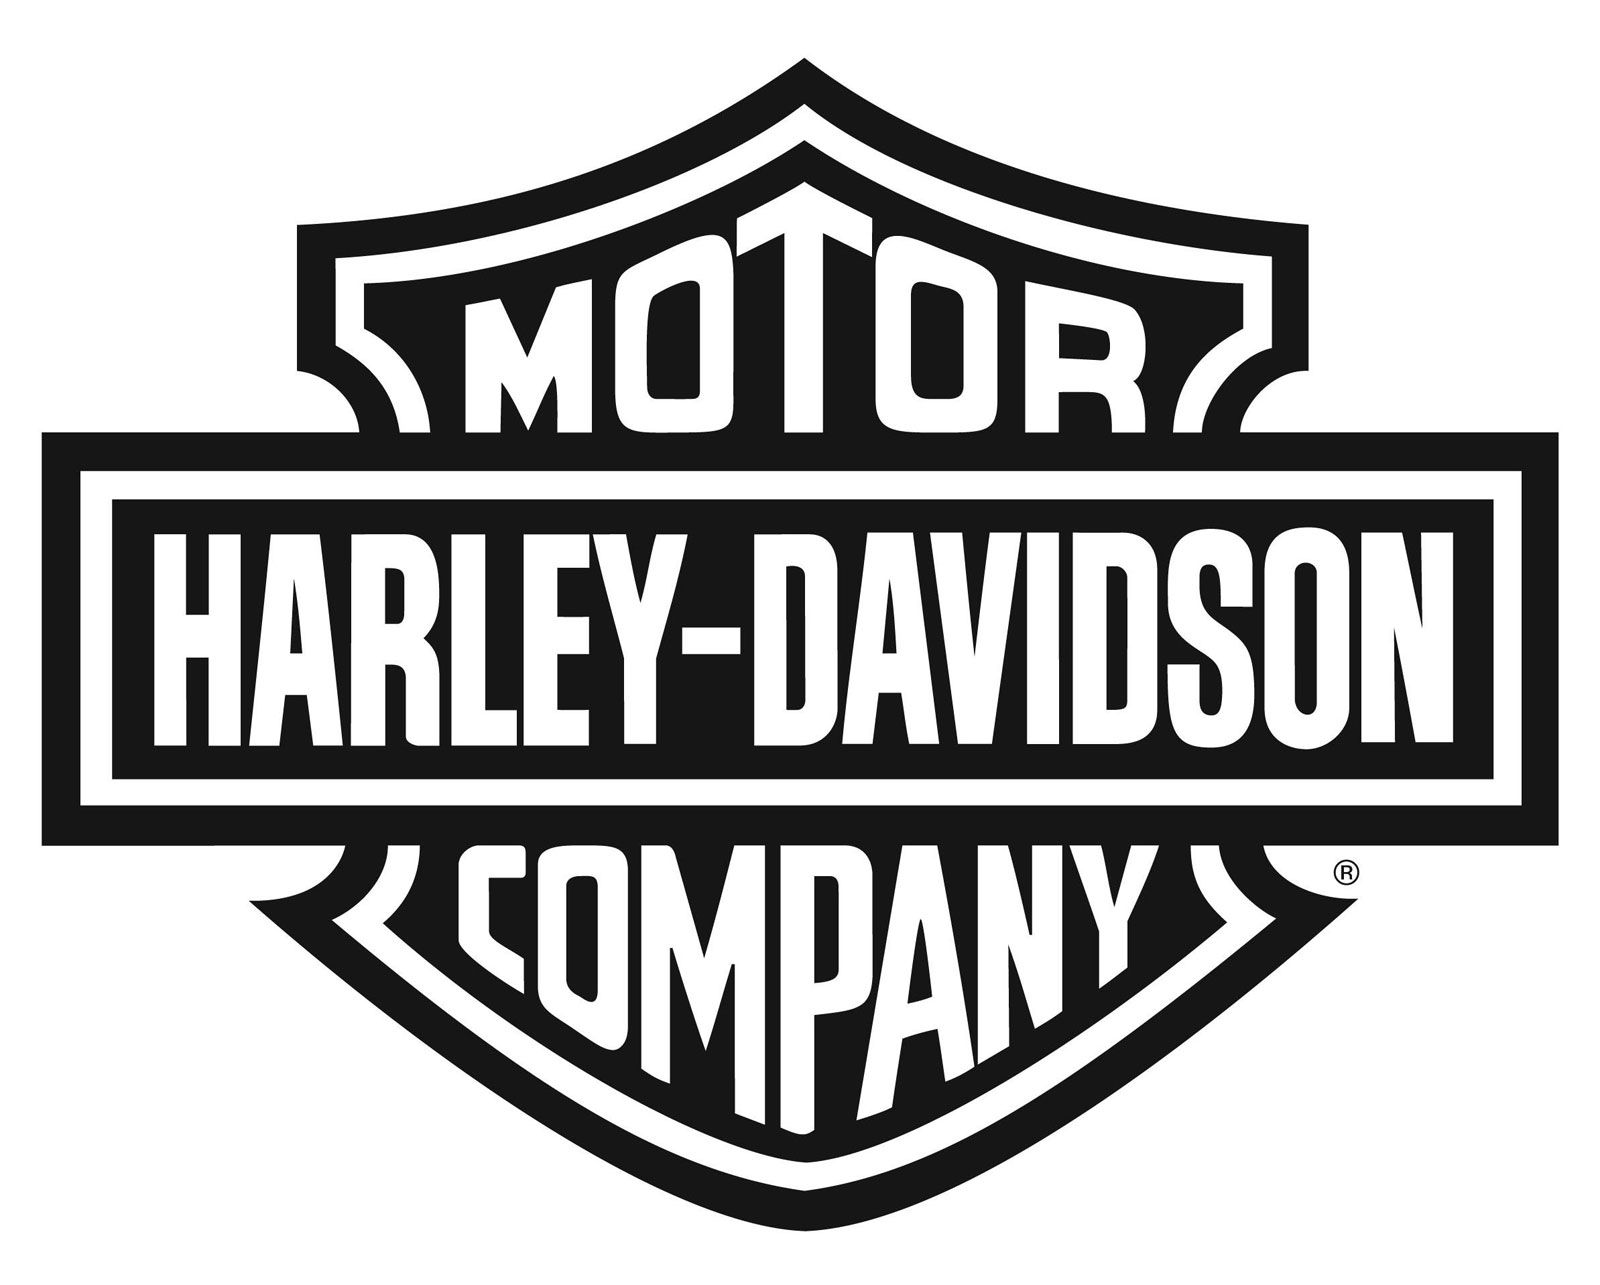 Harleydavidsonmotorcyclewallpaperlogoblac6876